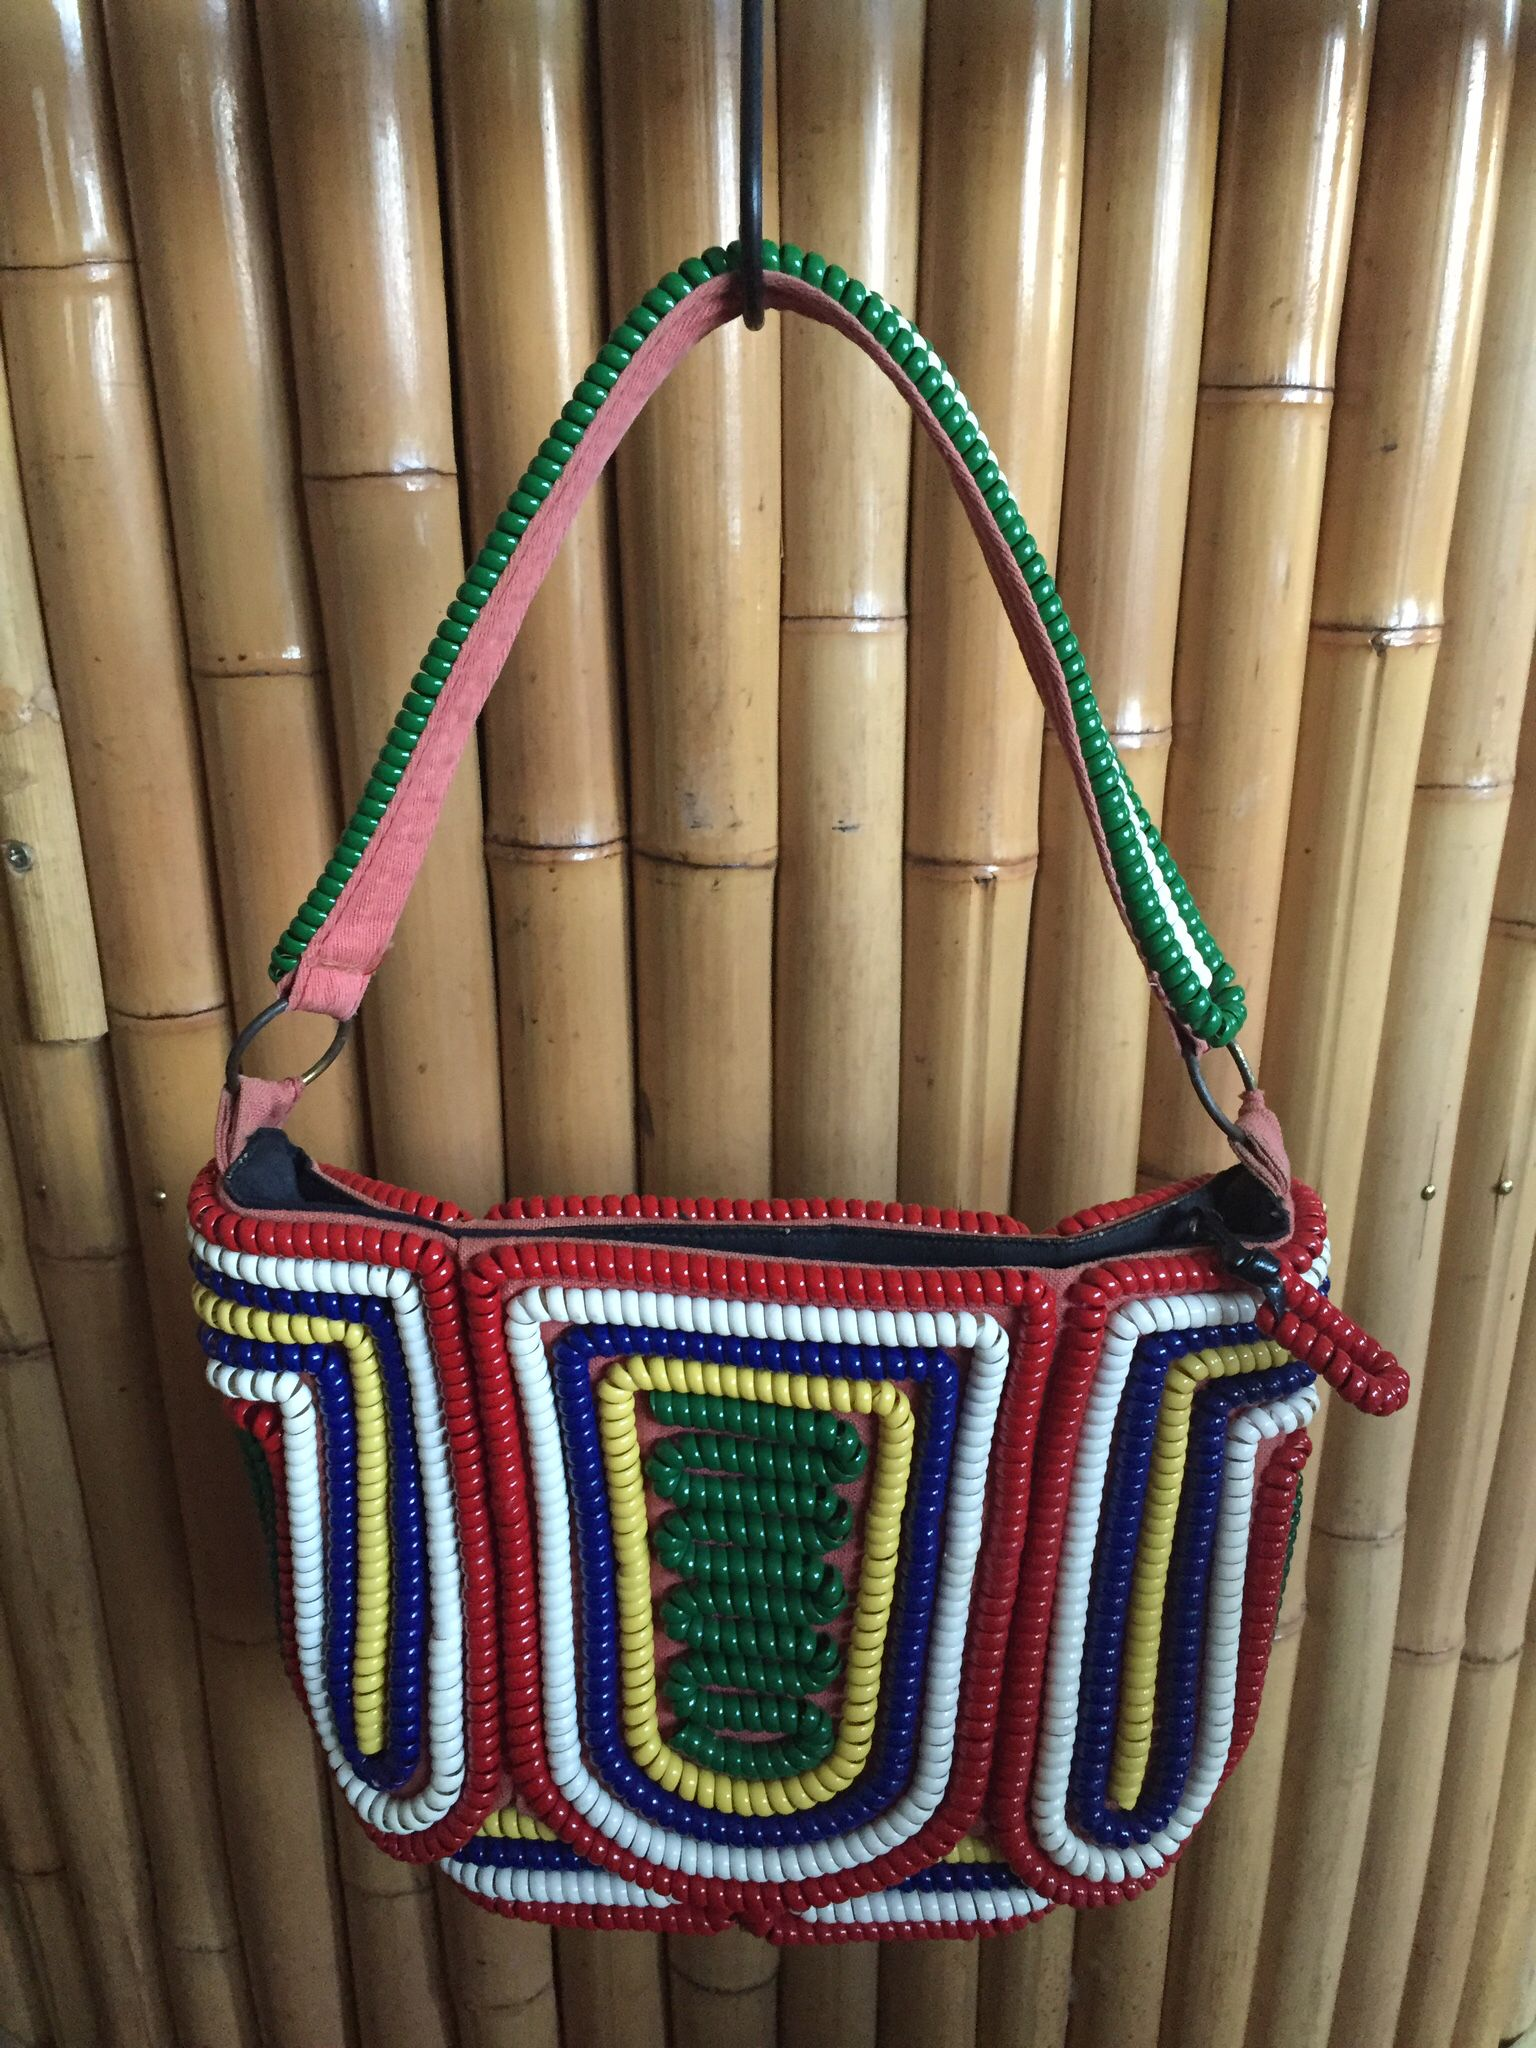 Telephone cord purse